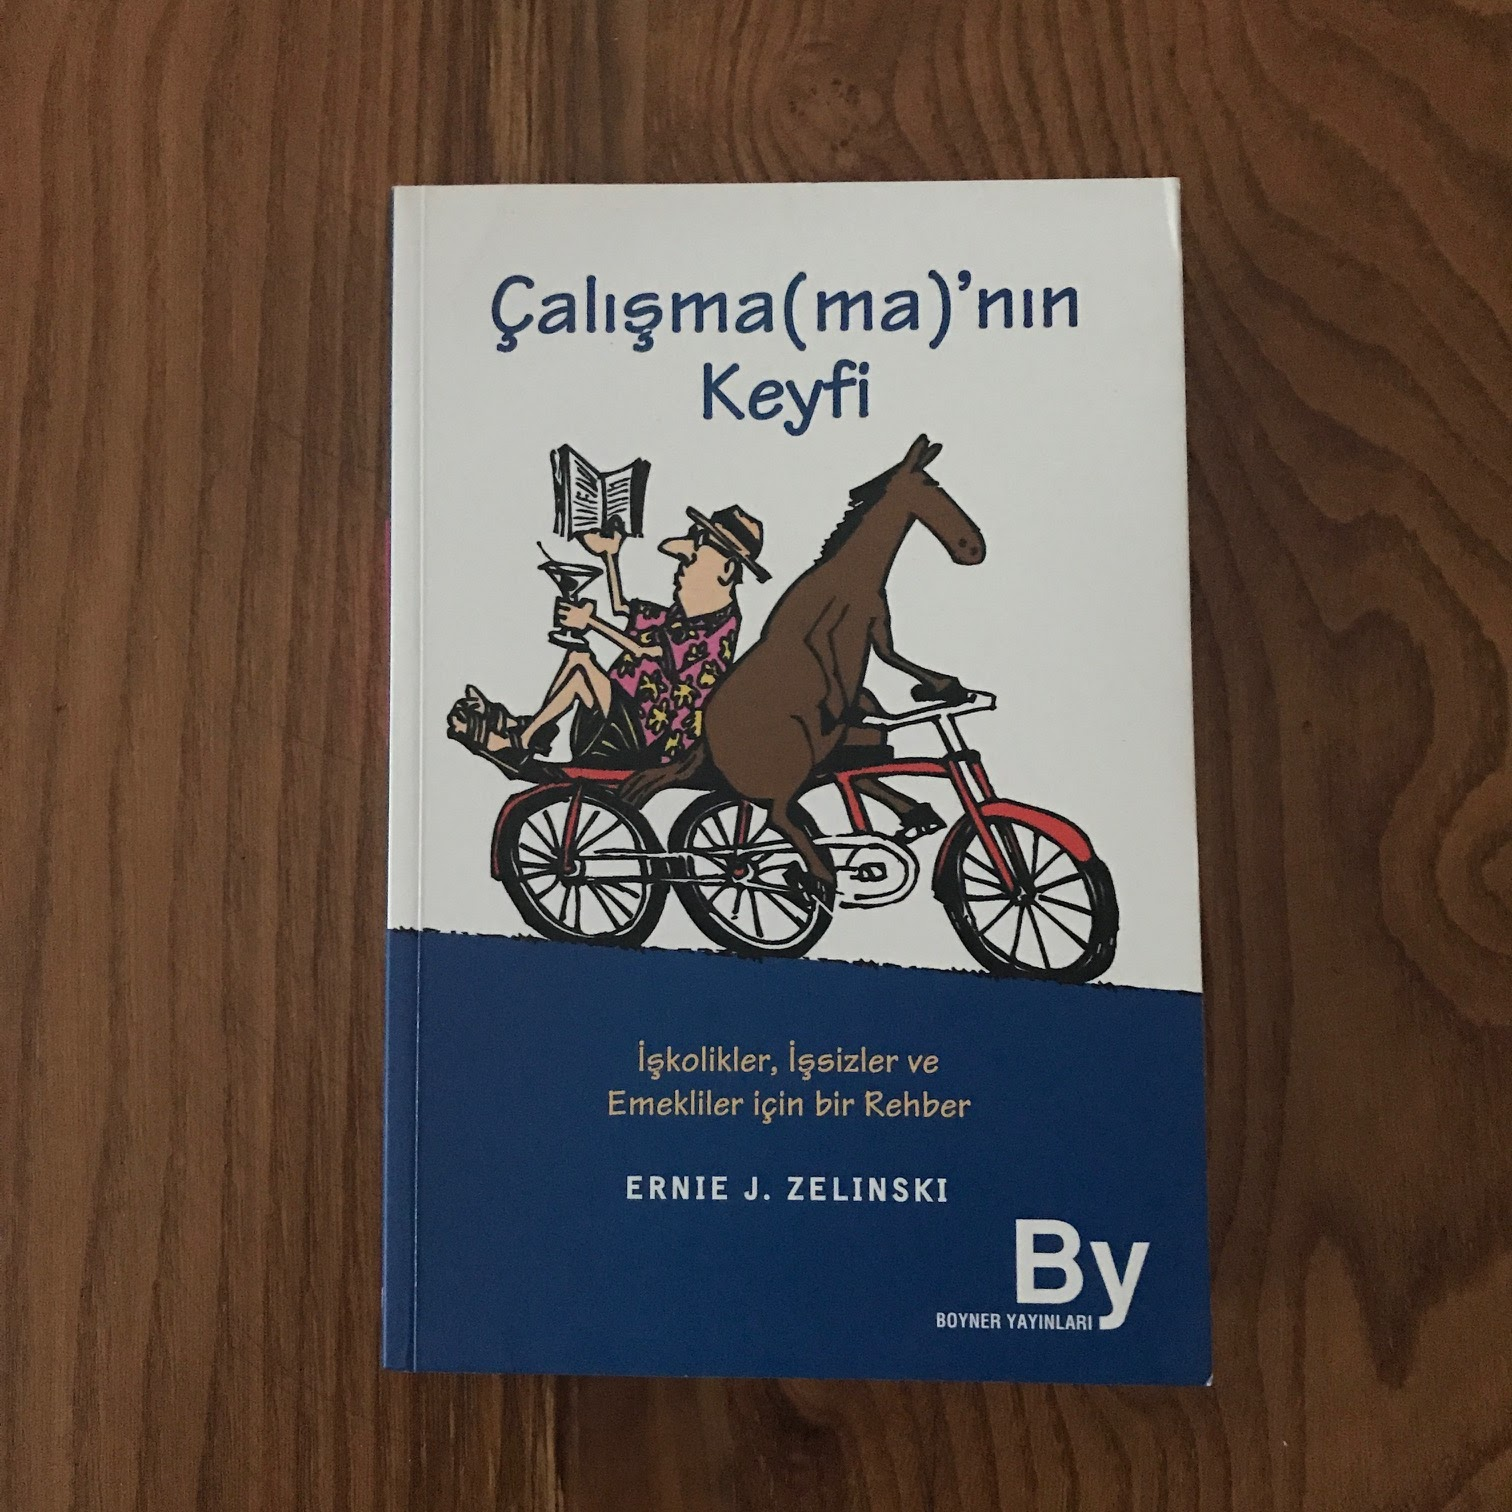 Calisma(ma)nin Keyfi